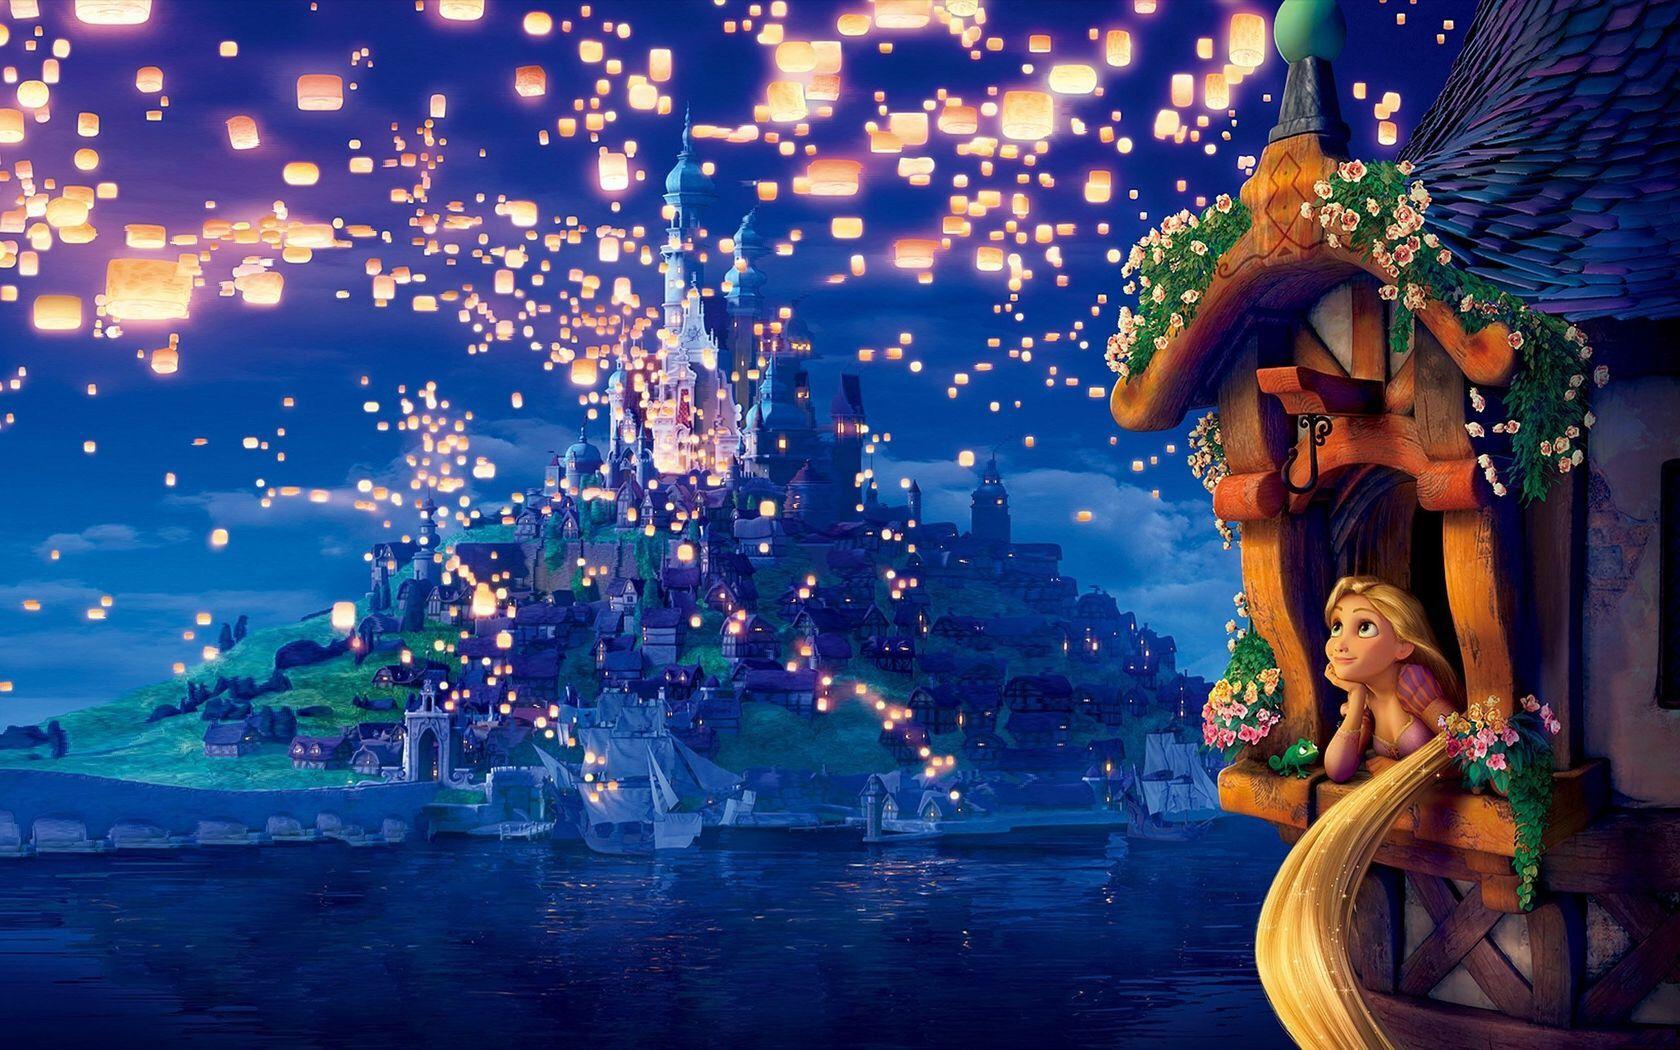 rapunzel lantern scene Google Search Tangled wallpaper